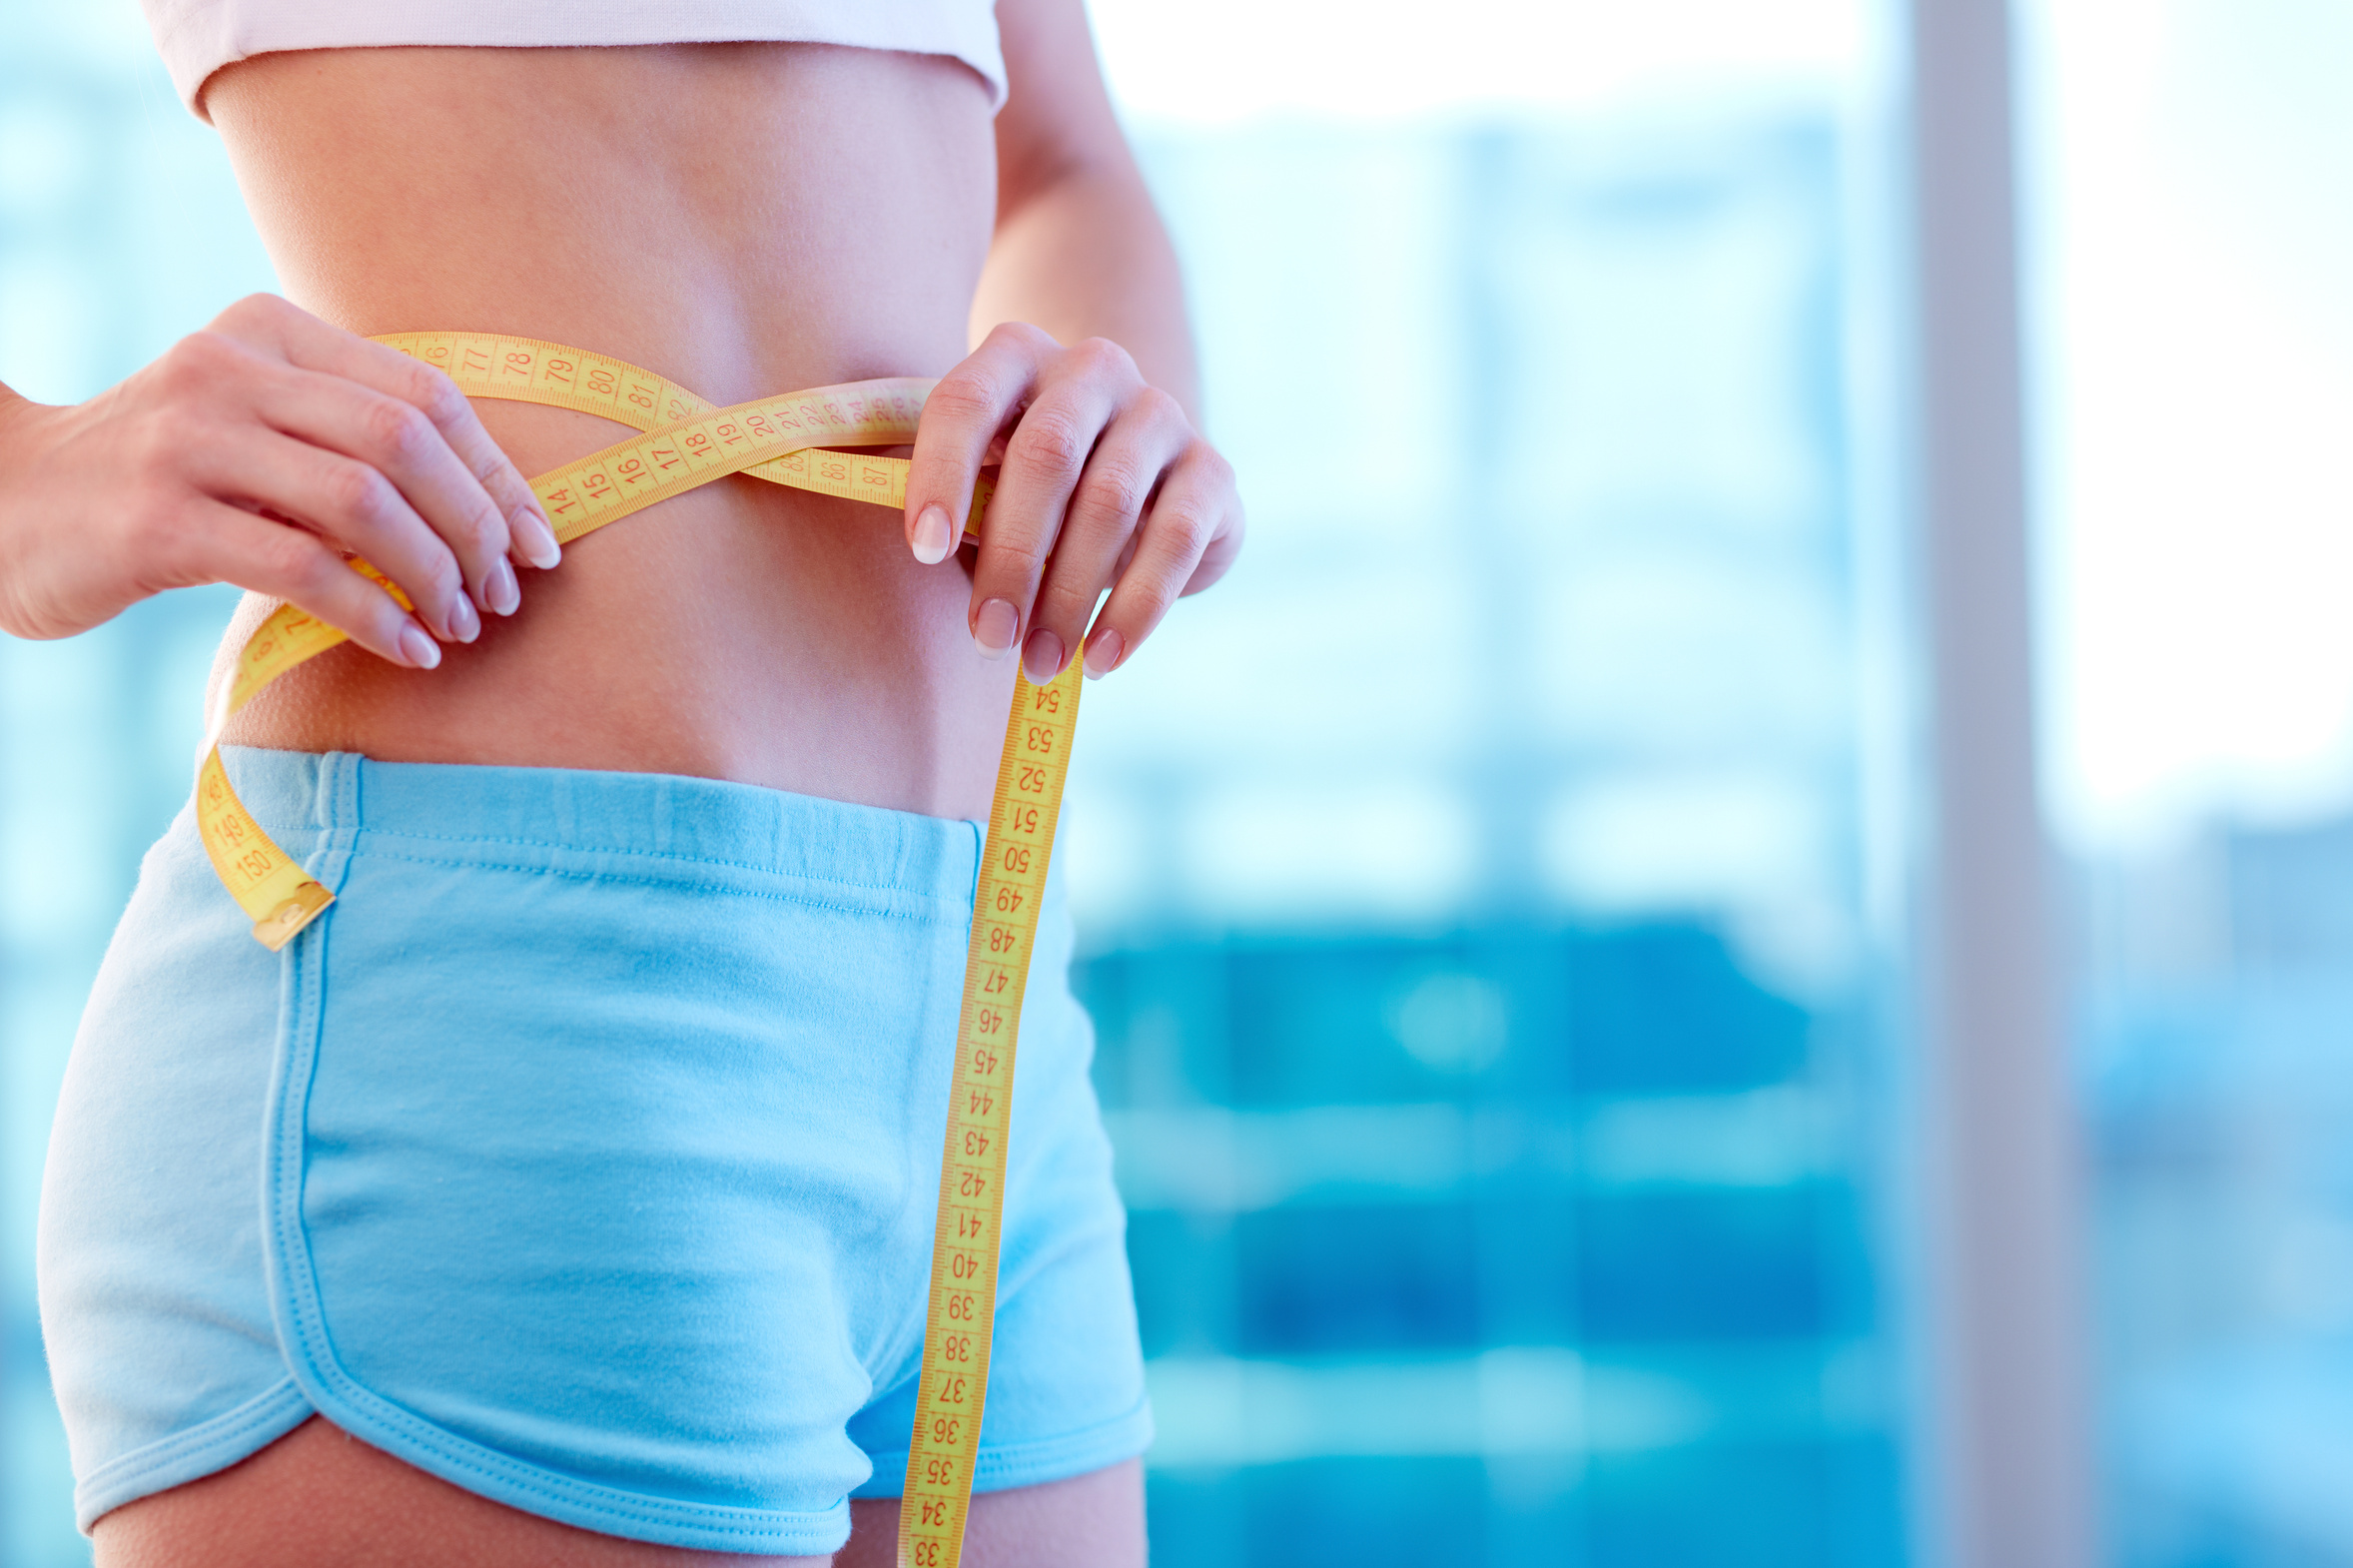 Pin on Nutrition - Pierdere în greutate honolulu